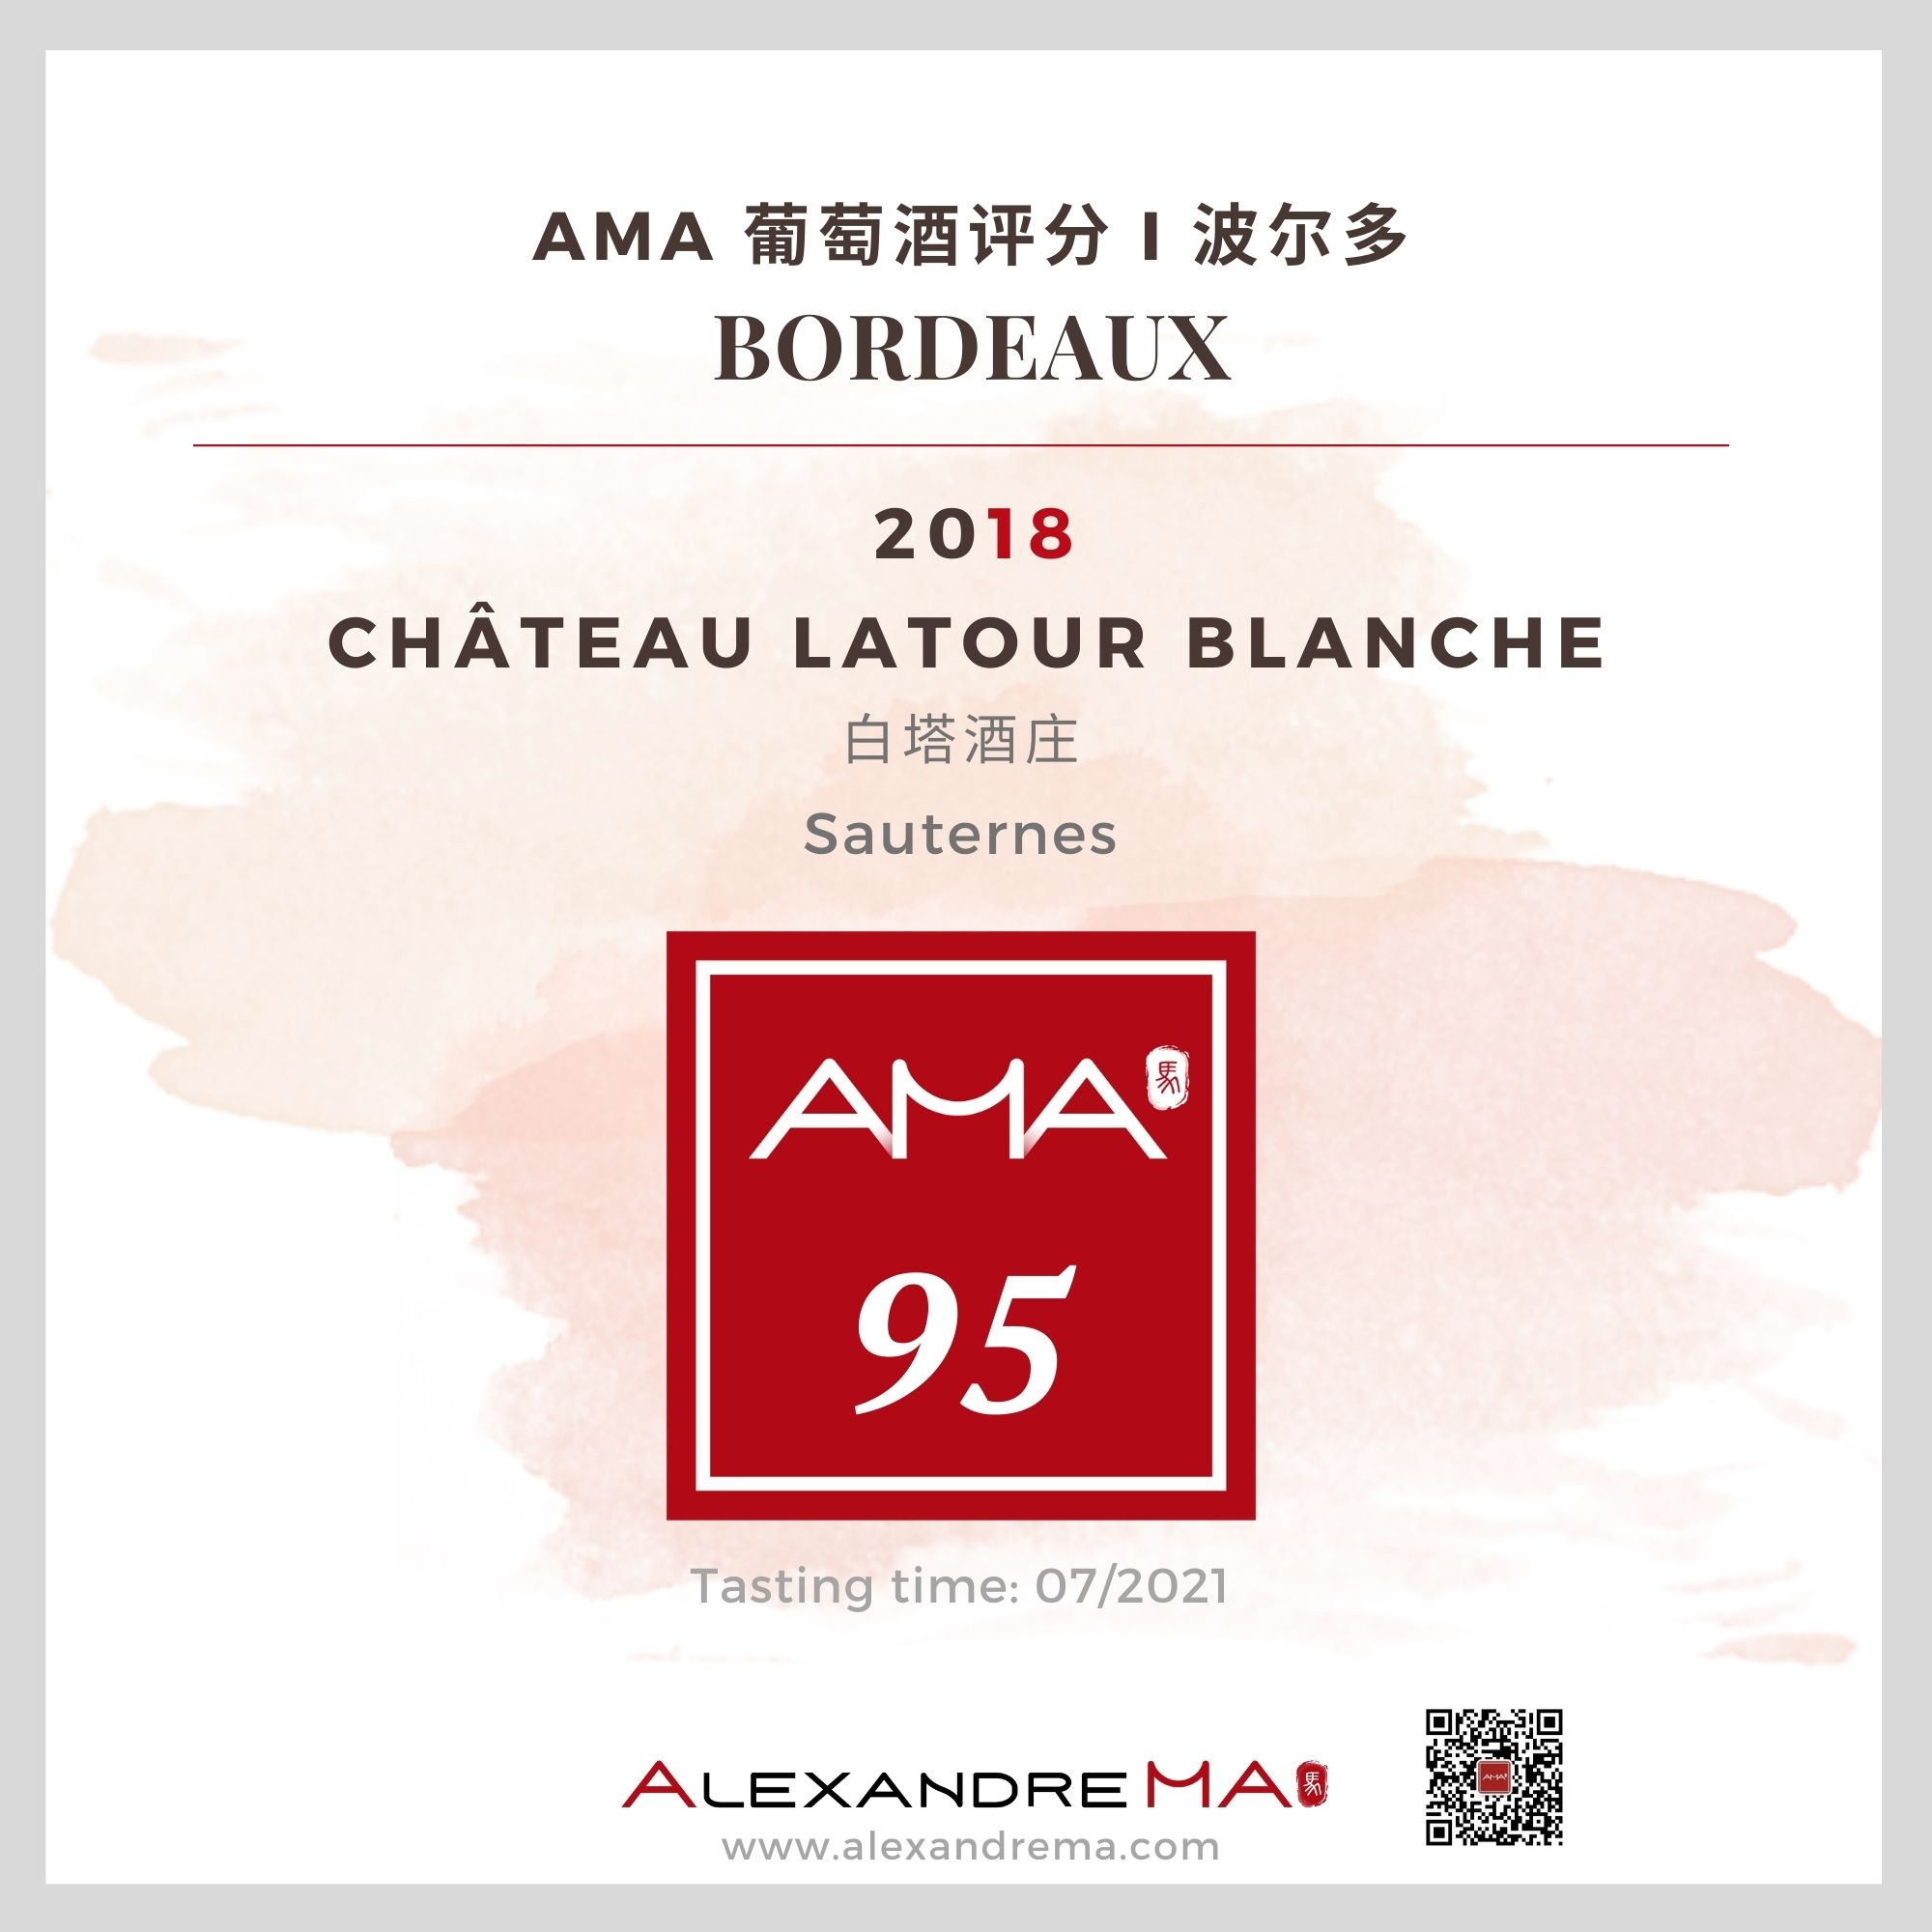 Château Latour Blanche 2018 白塔酒庄 - Alexandre Ma